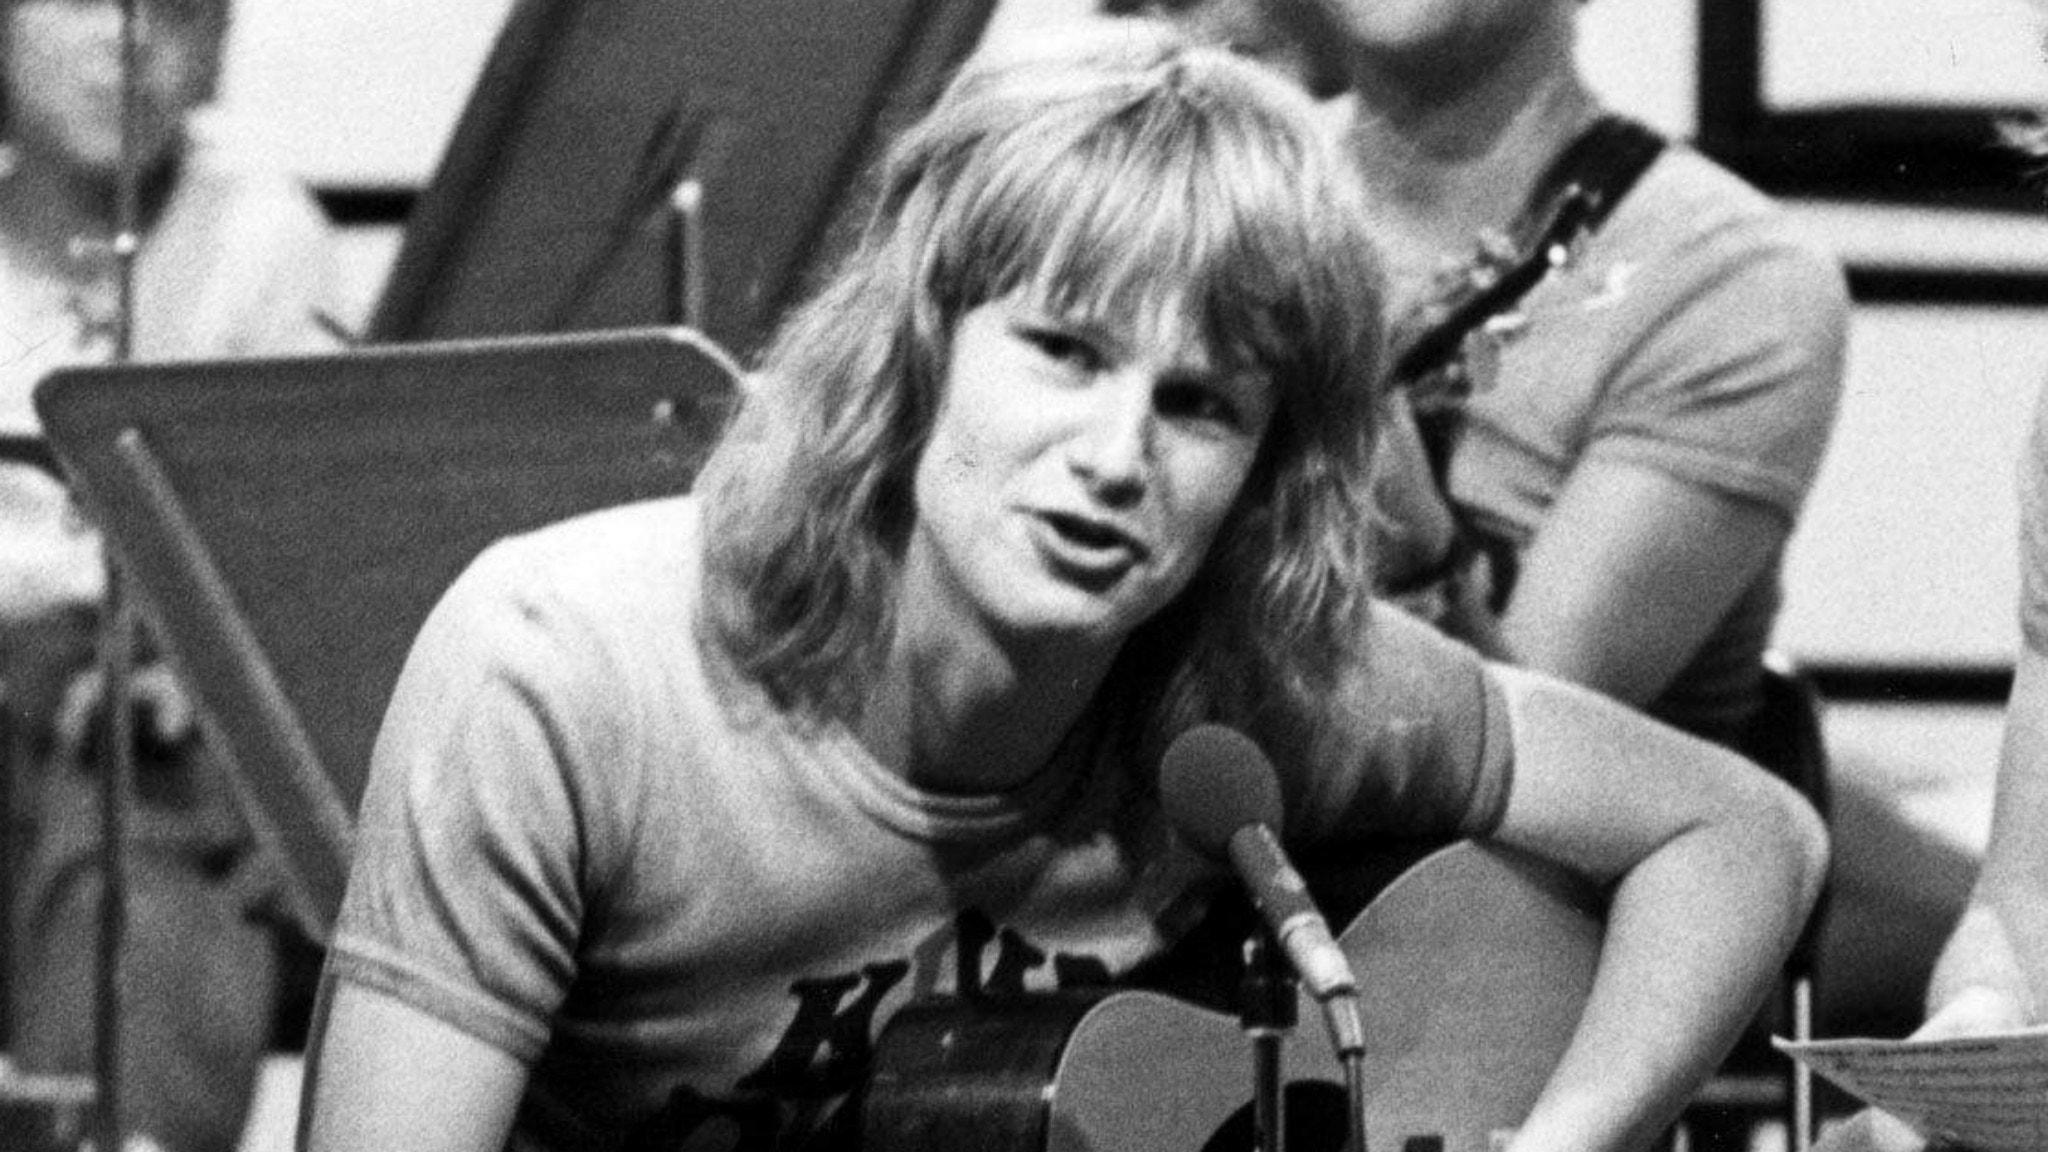 Peter Nordahl ger Ted Gärdestads musik nytt liv